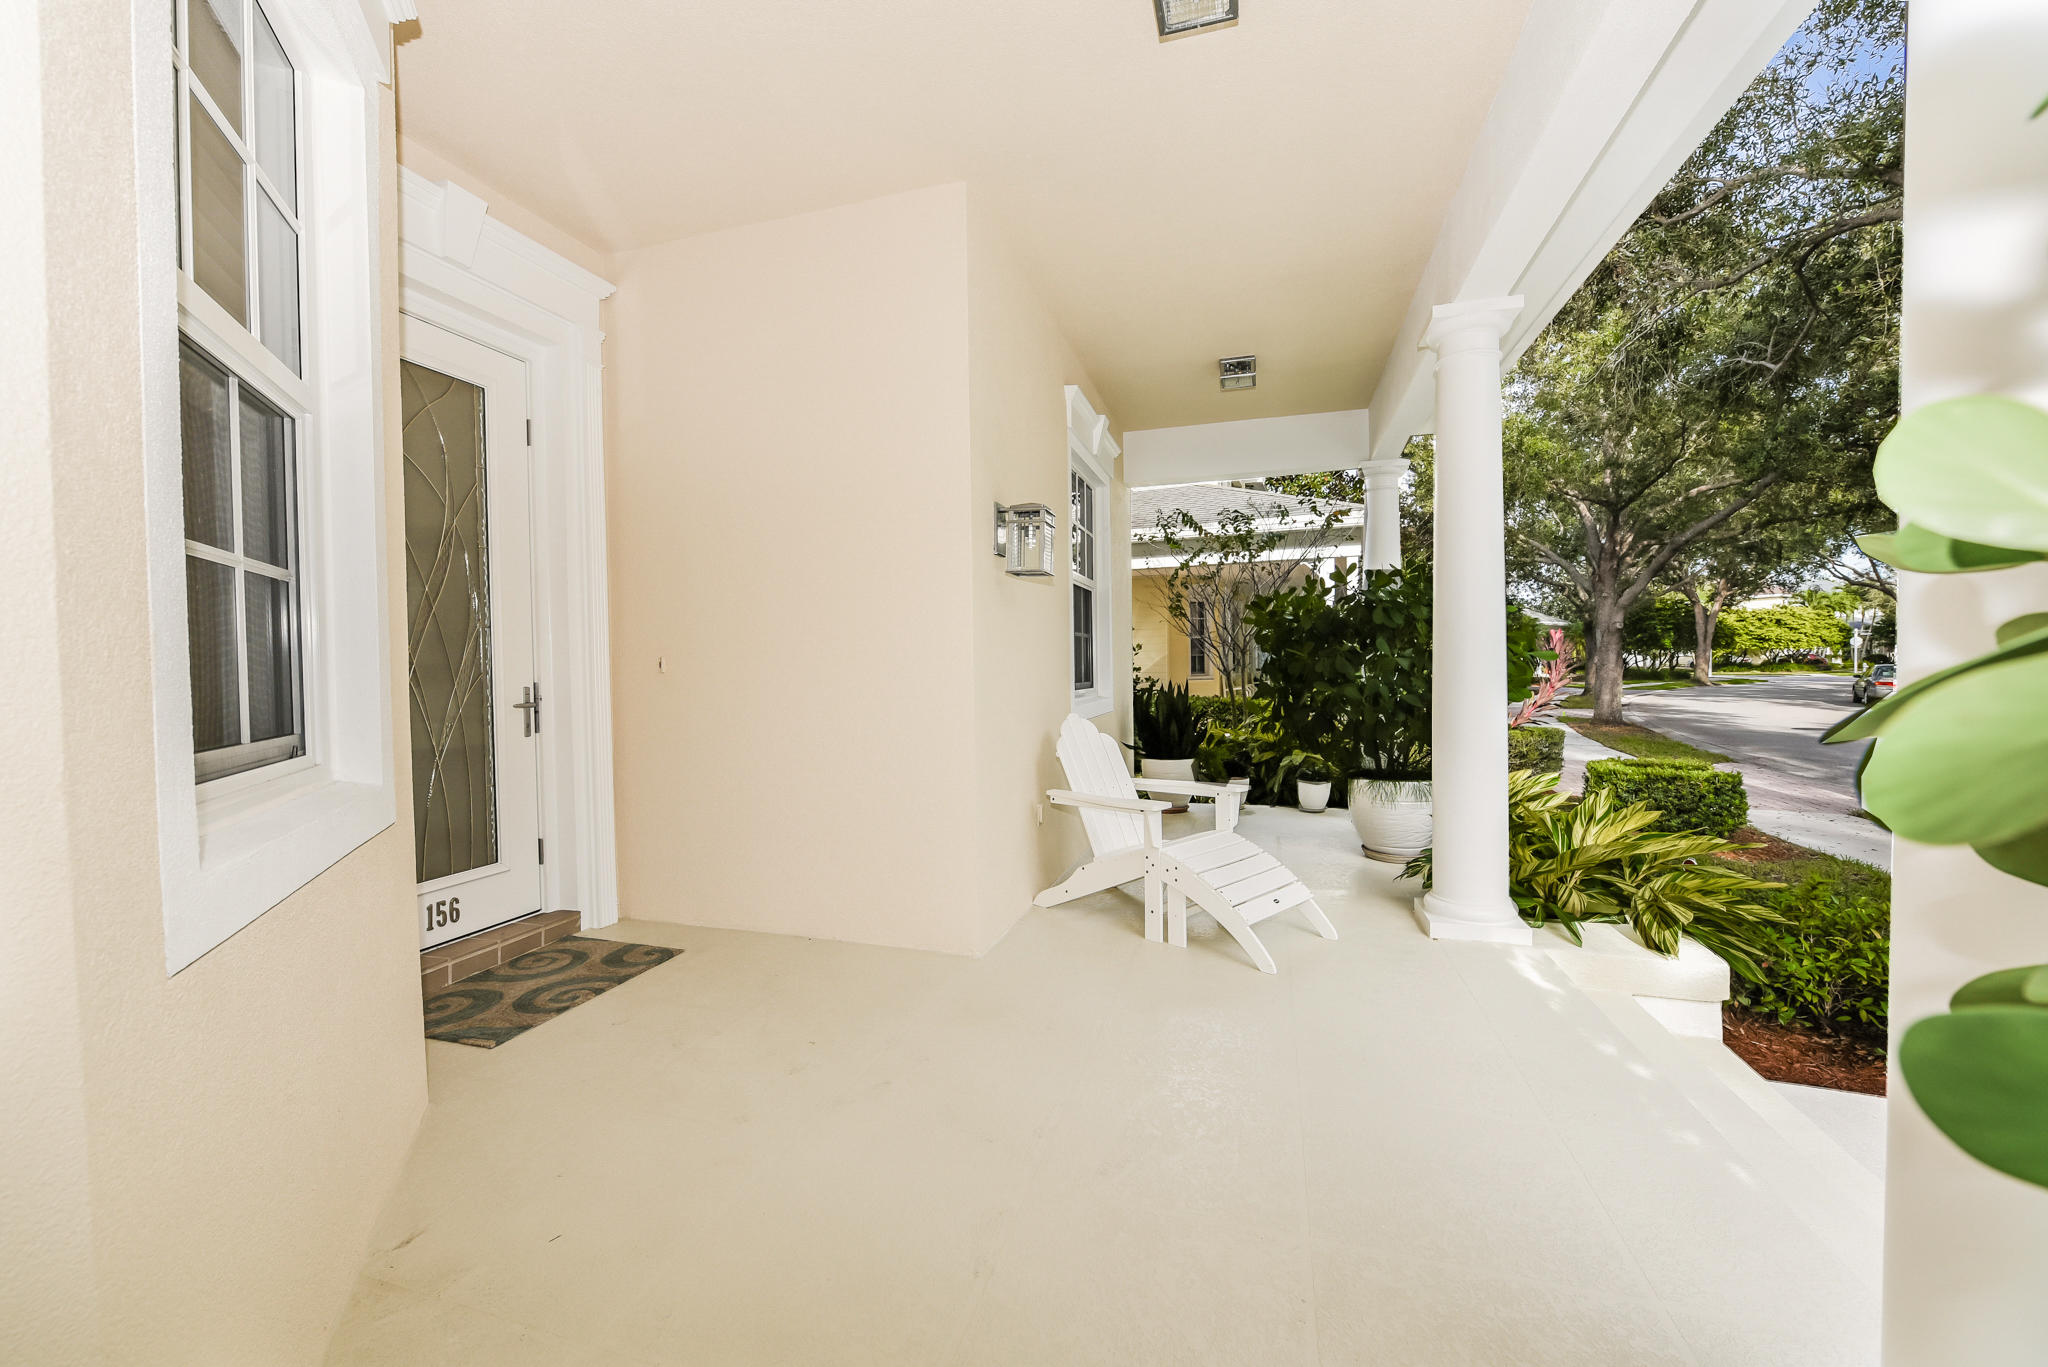 156 Barbados Drive  - Abacoa Homes - photo 12